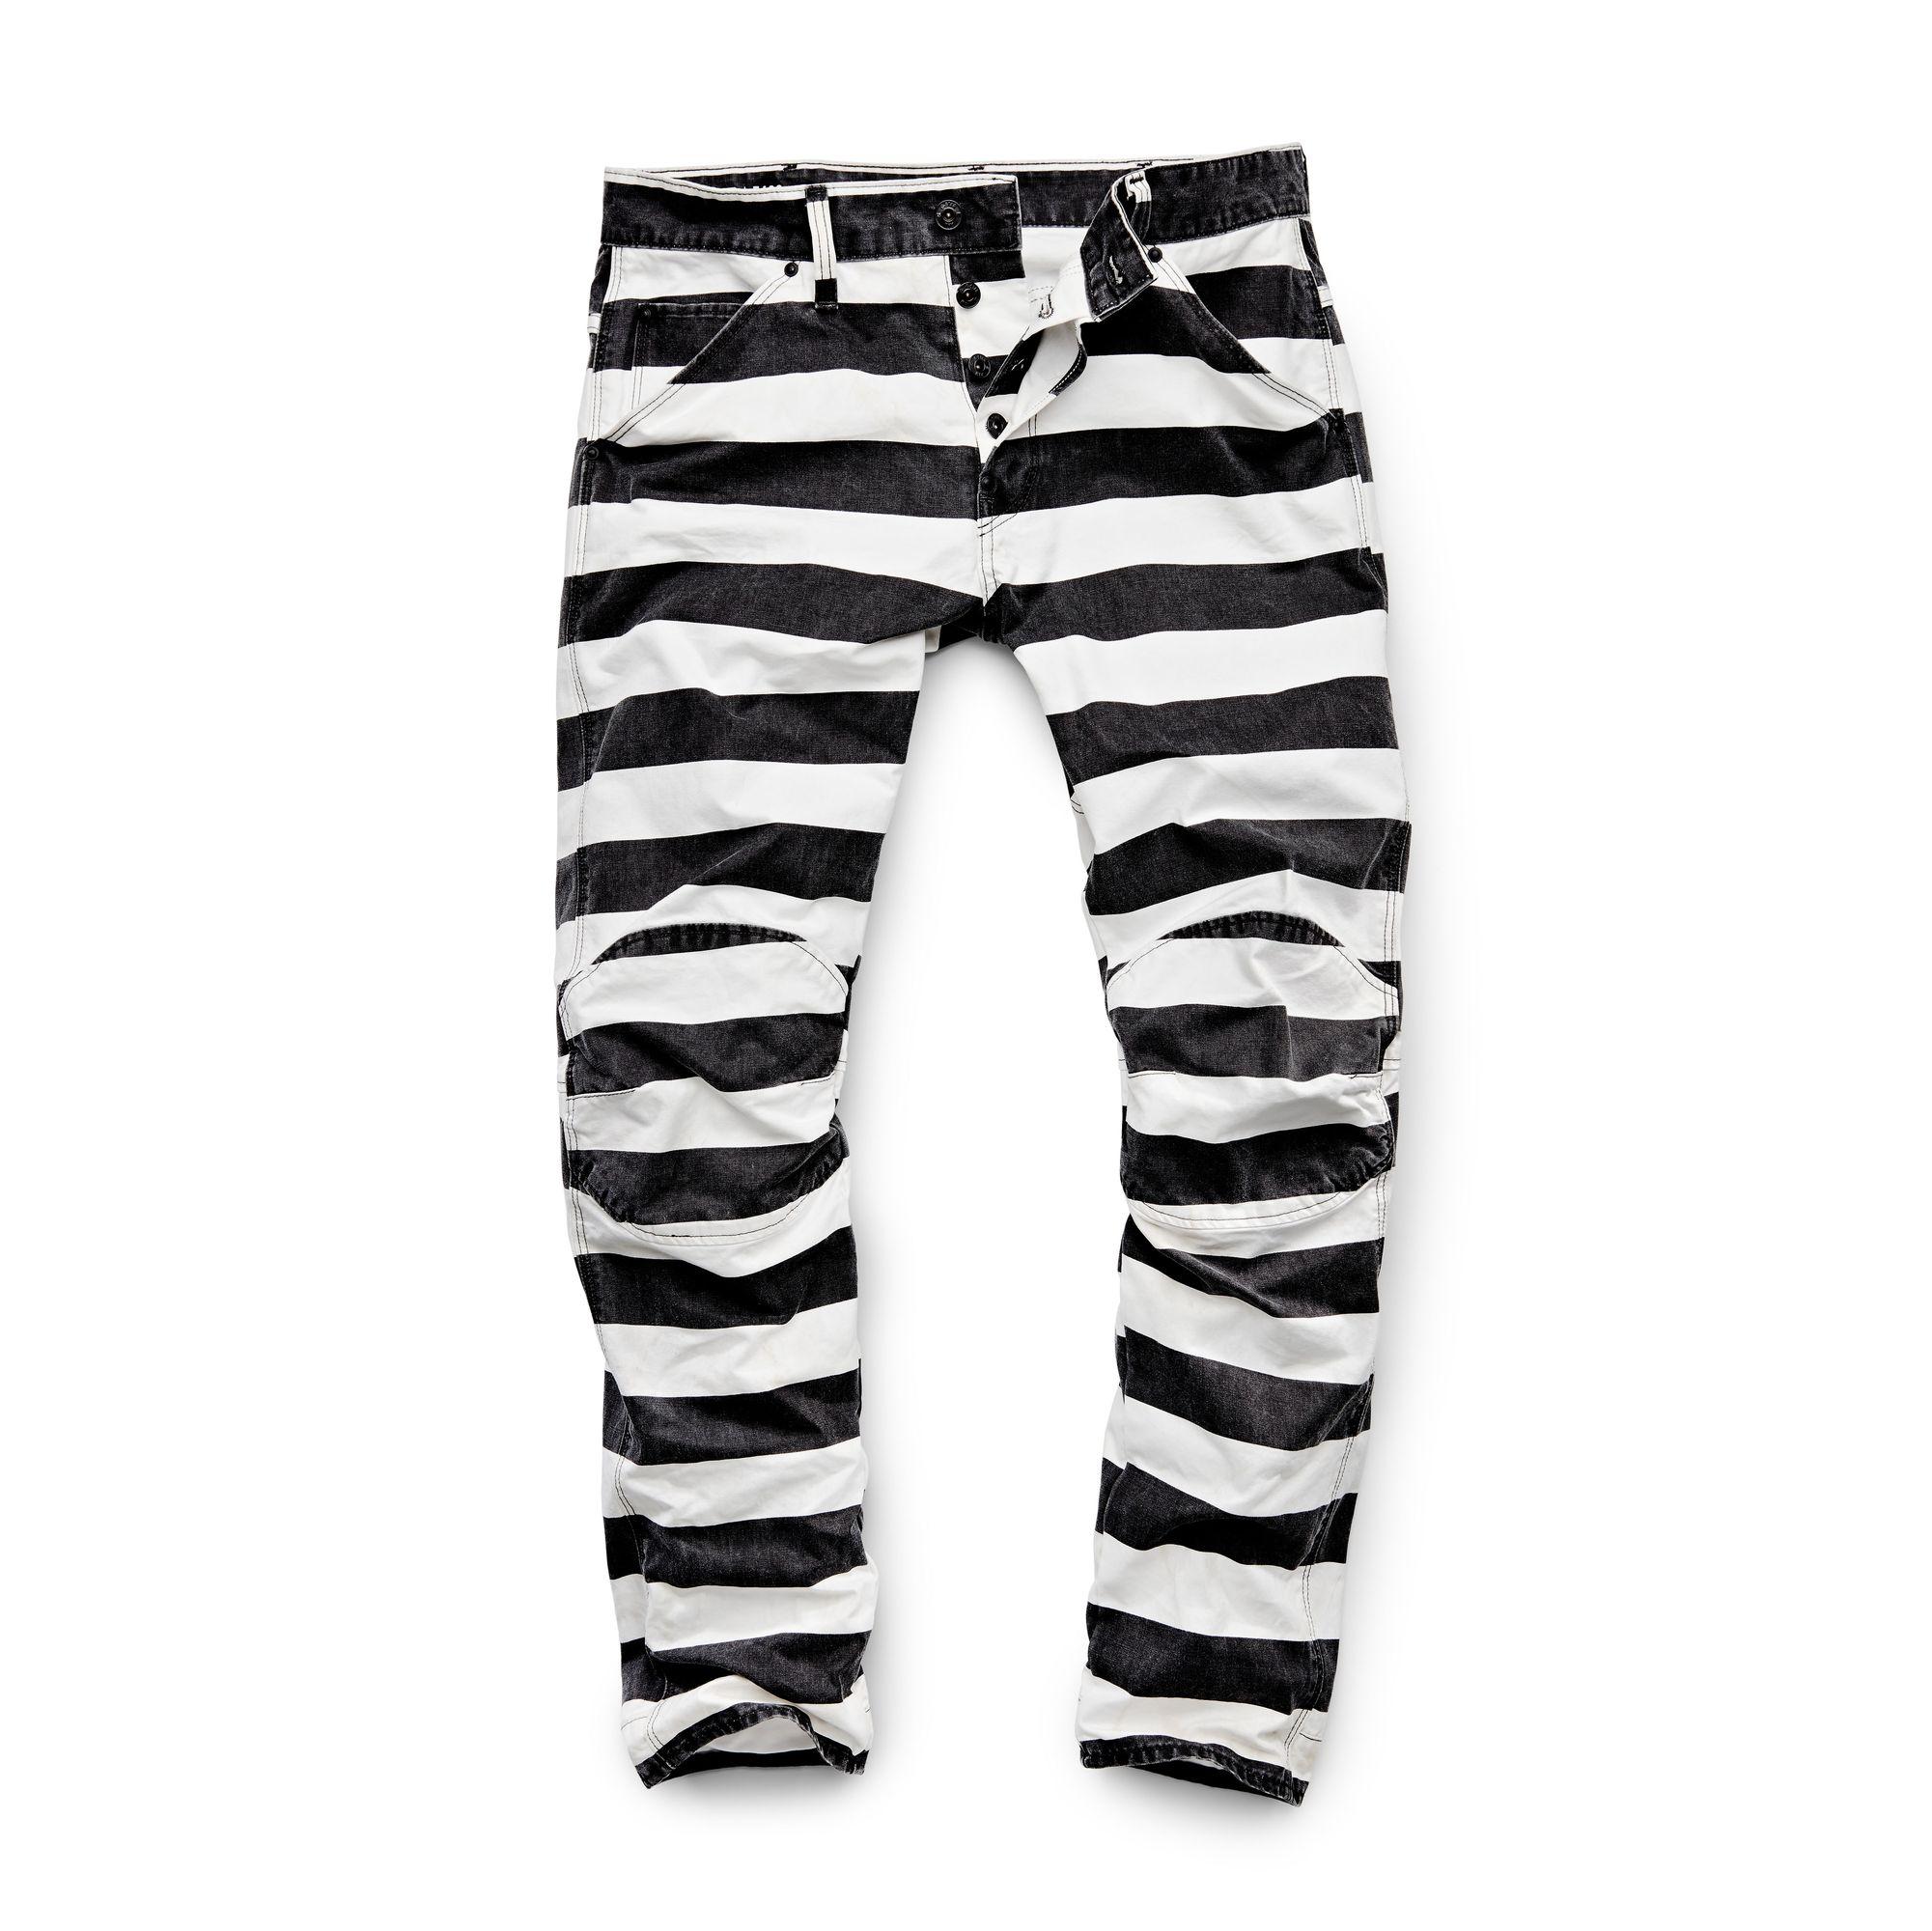 G-Star Elwood X25 3D Tapered Men's Jeans